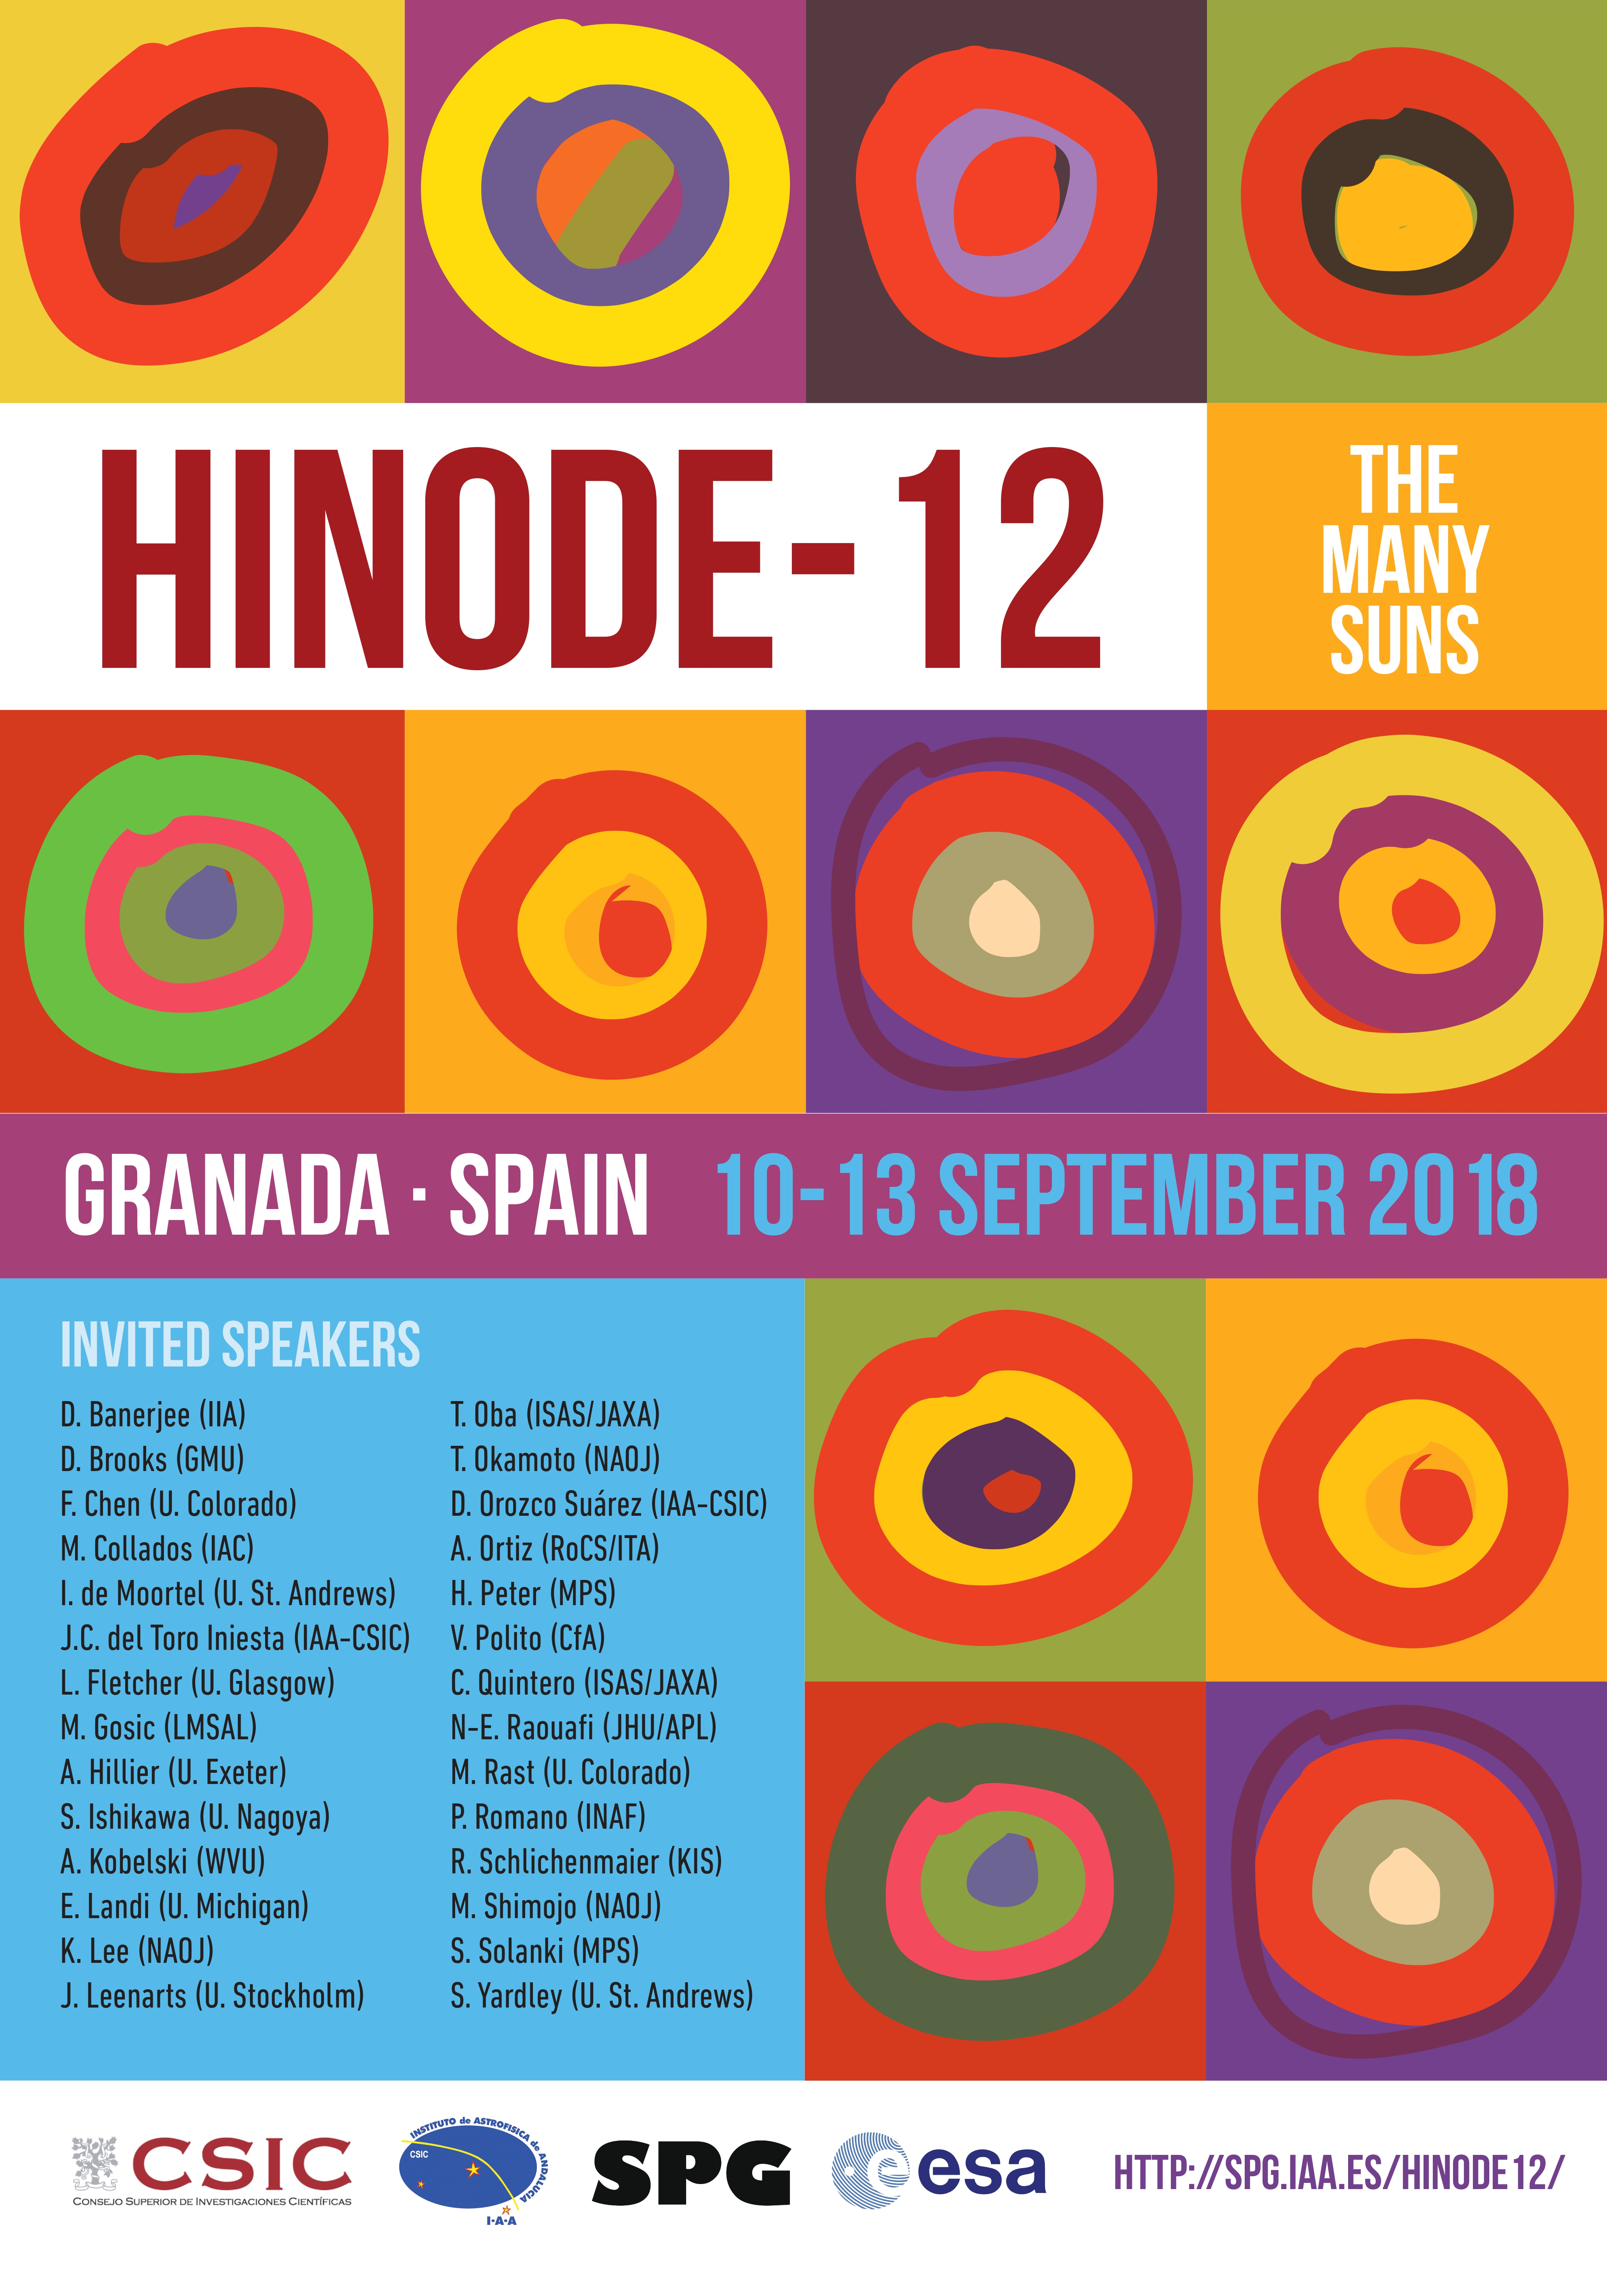 http://spg.iaa.es/hinode12/